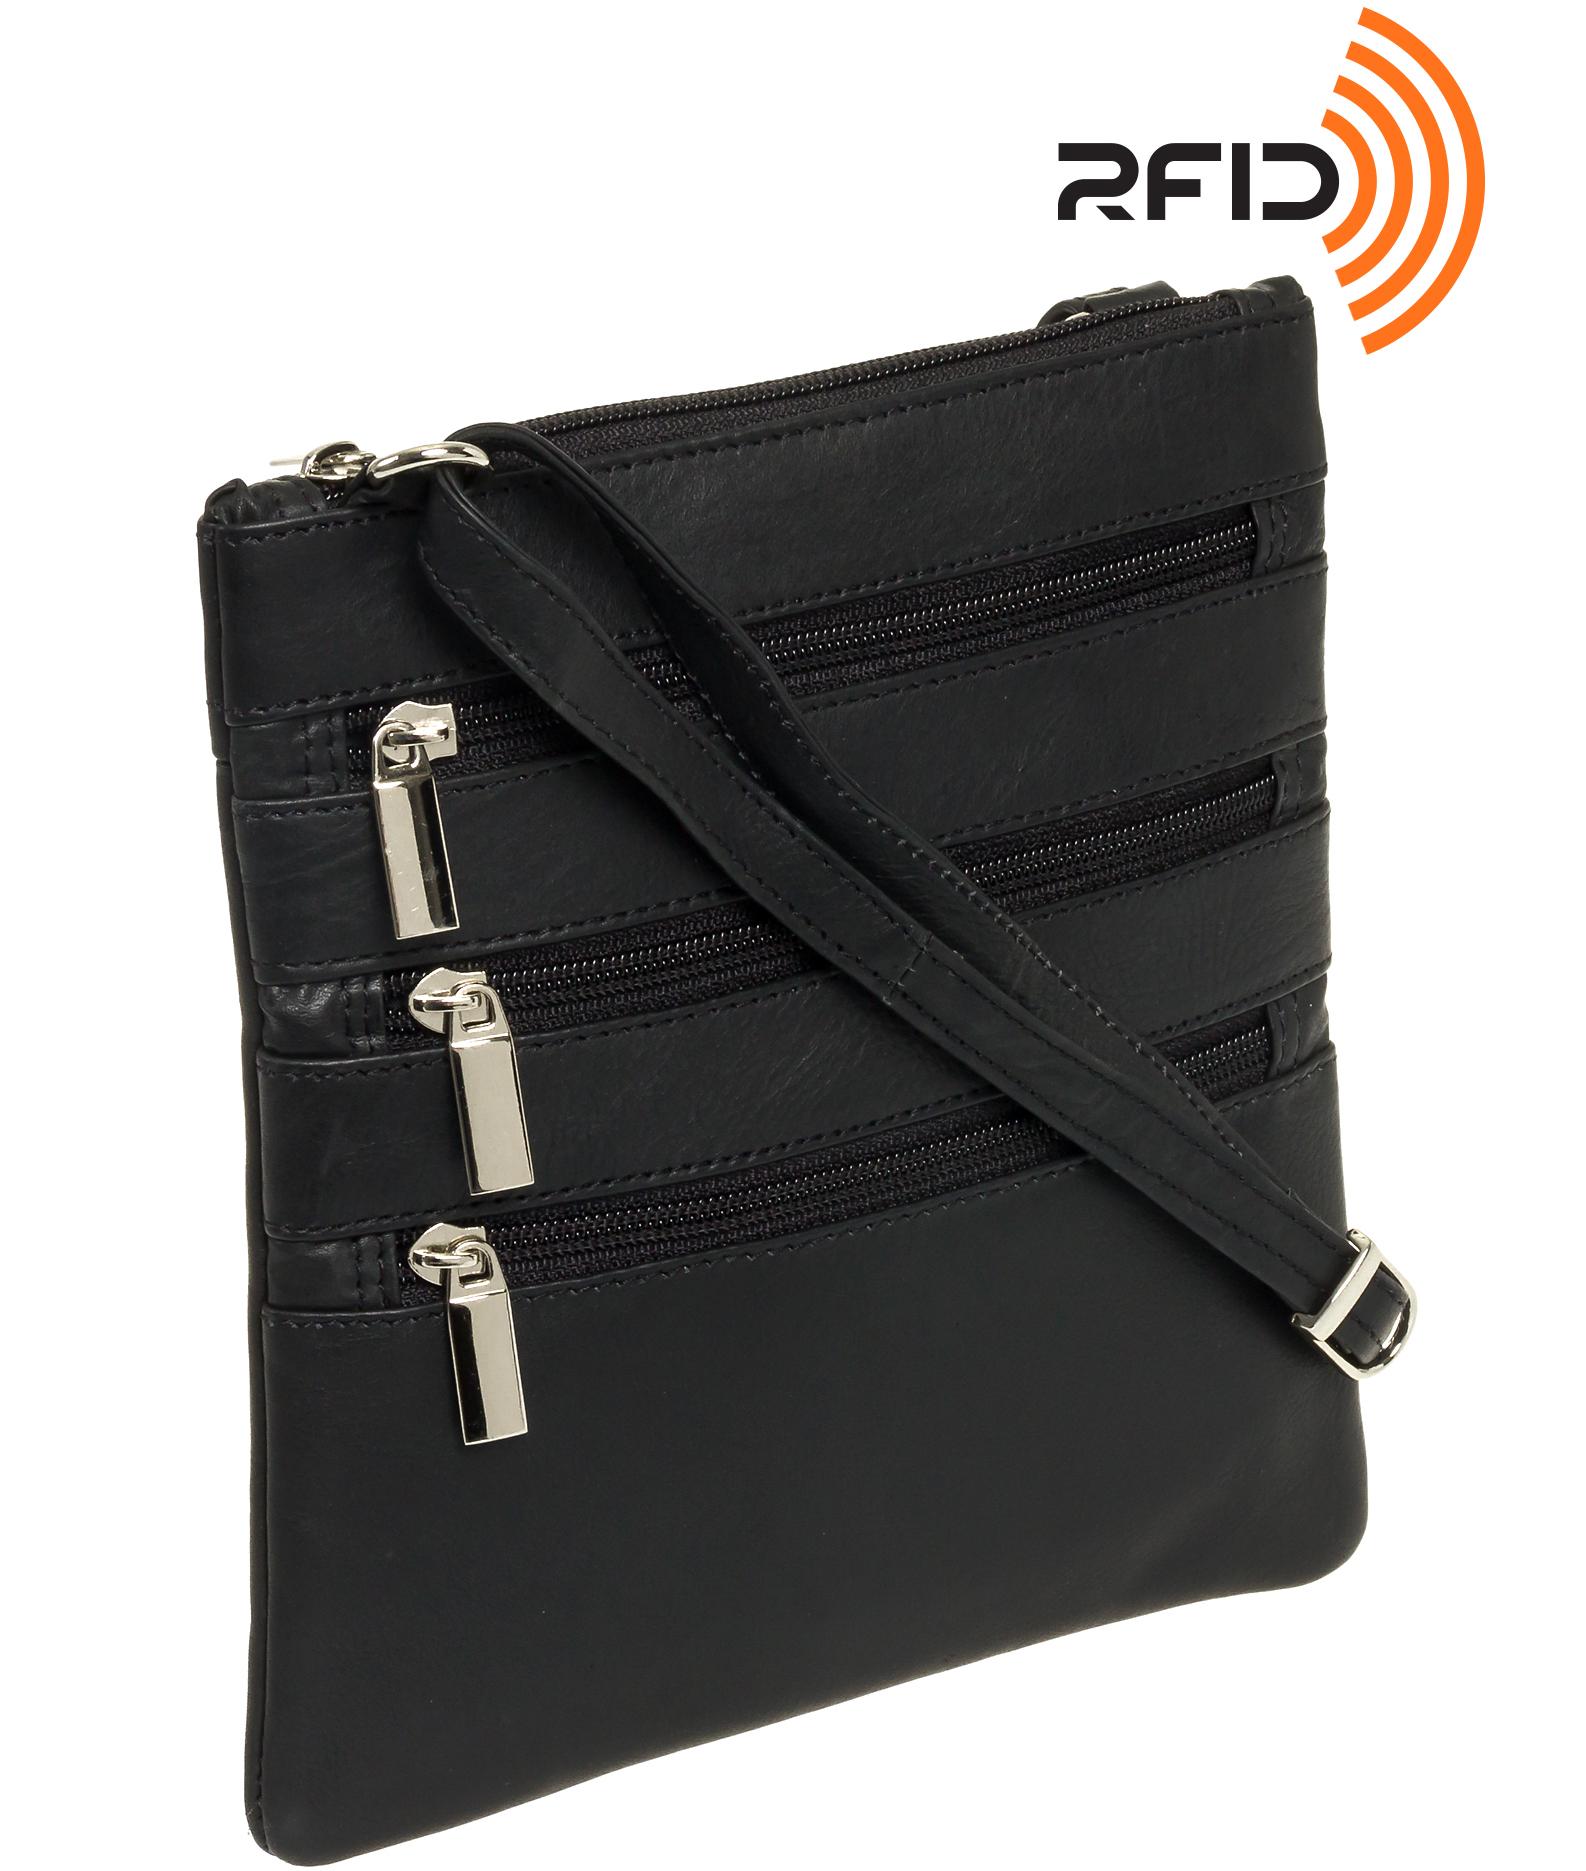 1556d976f Silver Lilly Womens RFID Protection Genuine Leather 3-Zipper Crossbody Bag  Purse   eBay